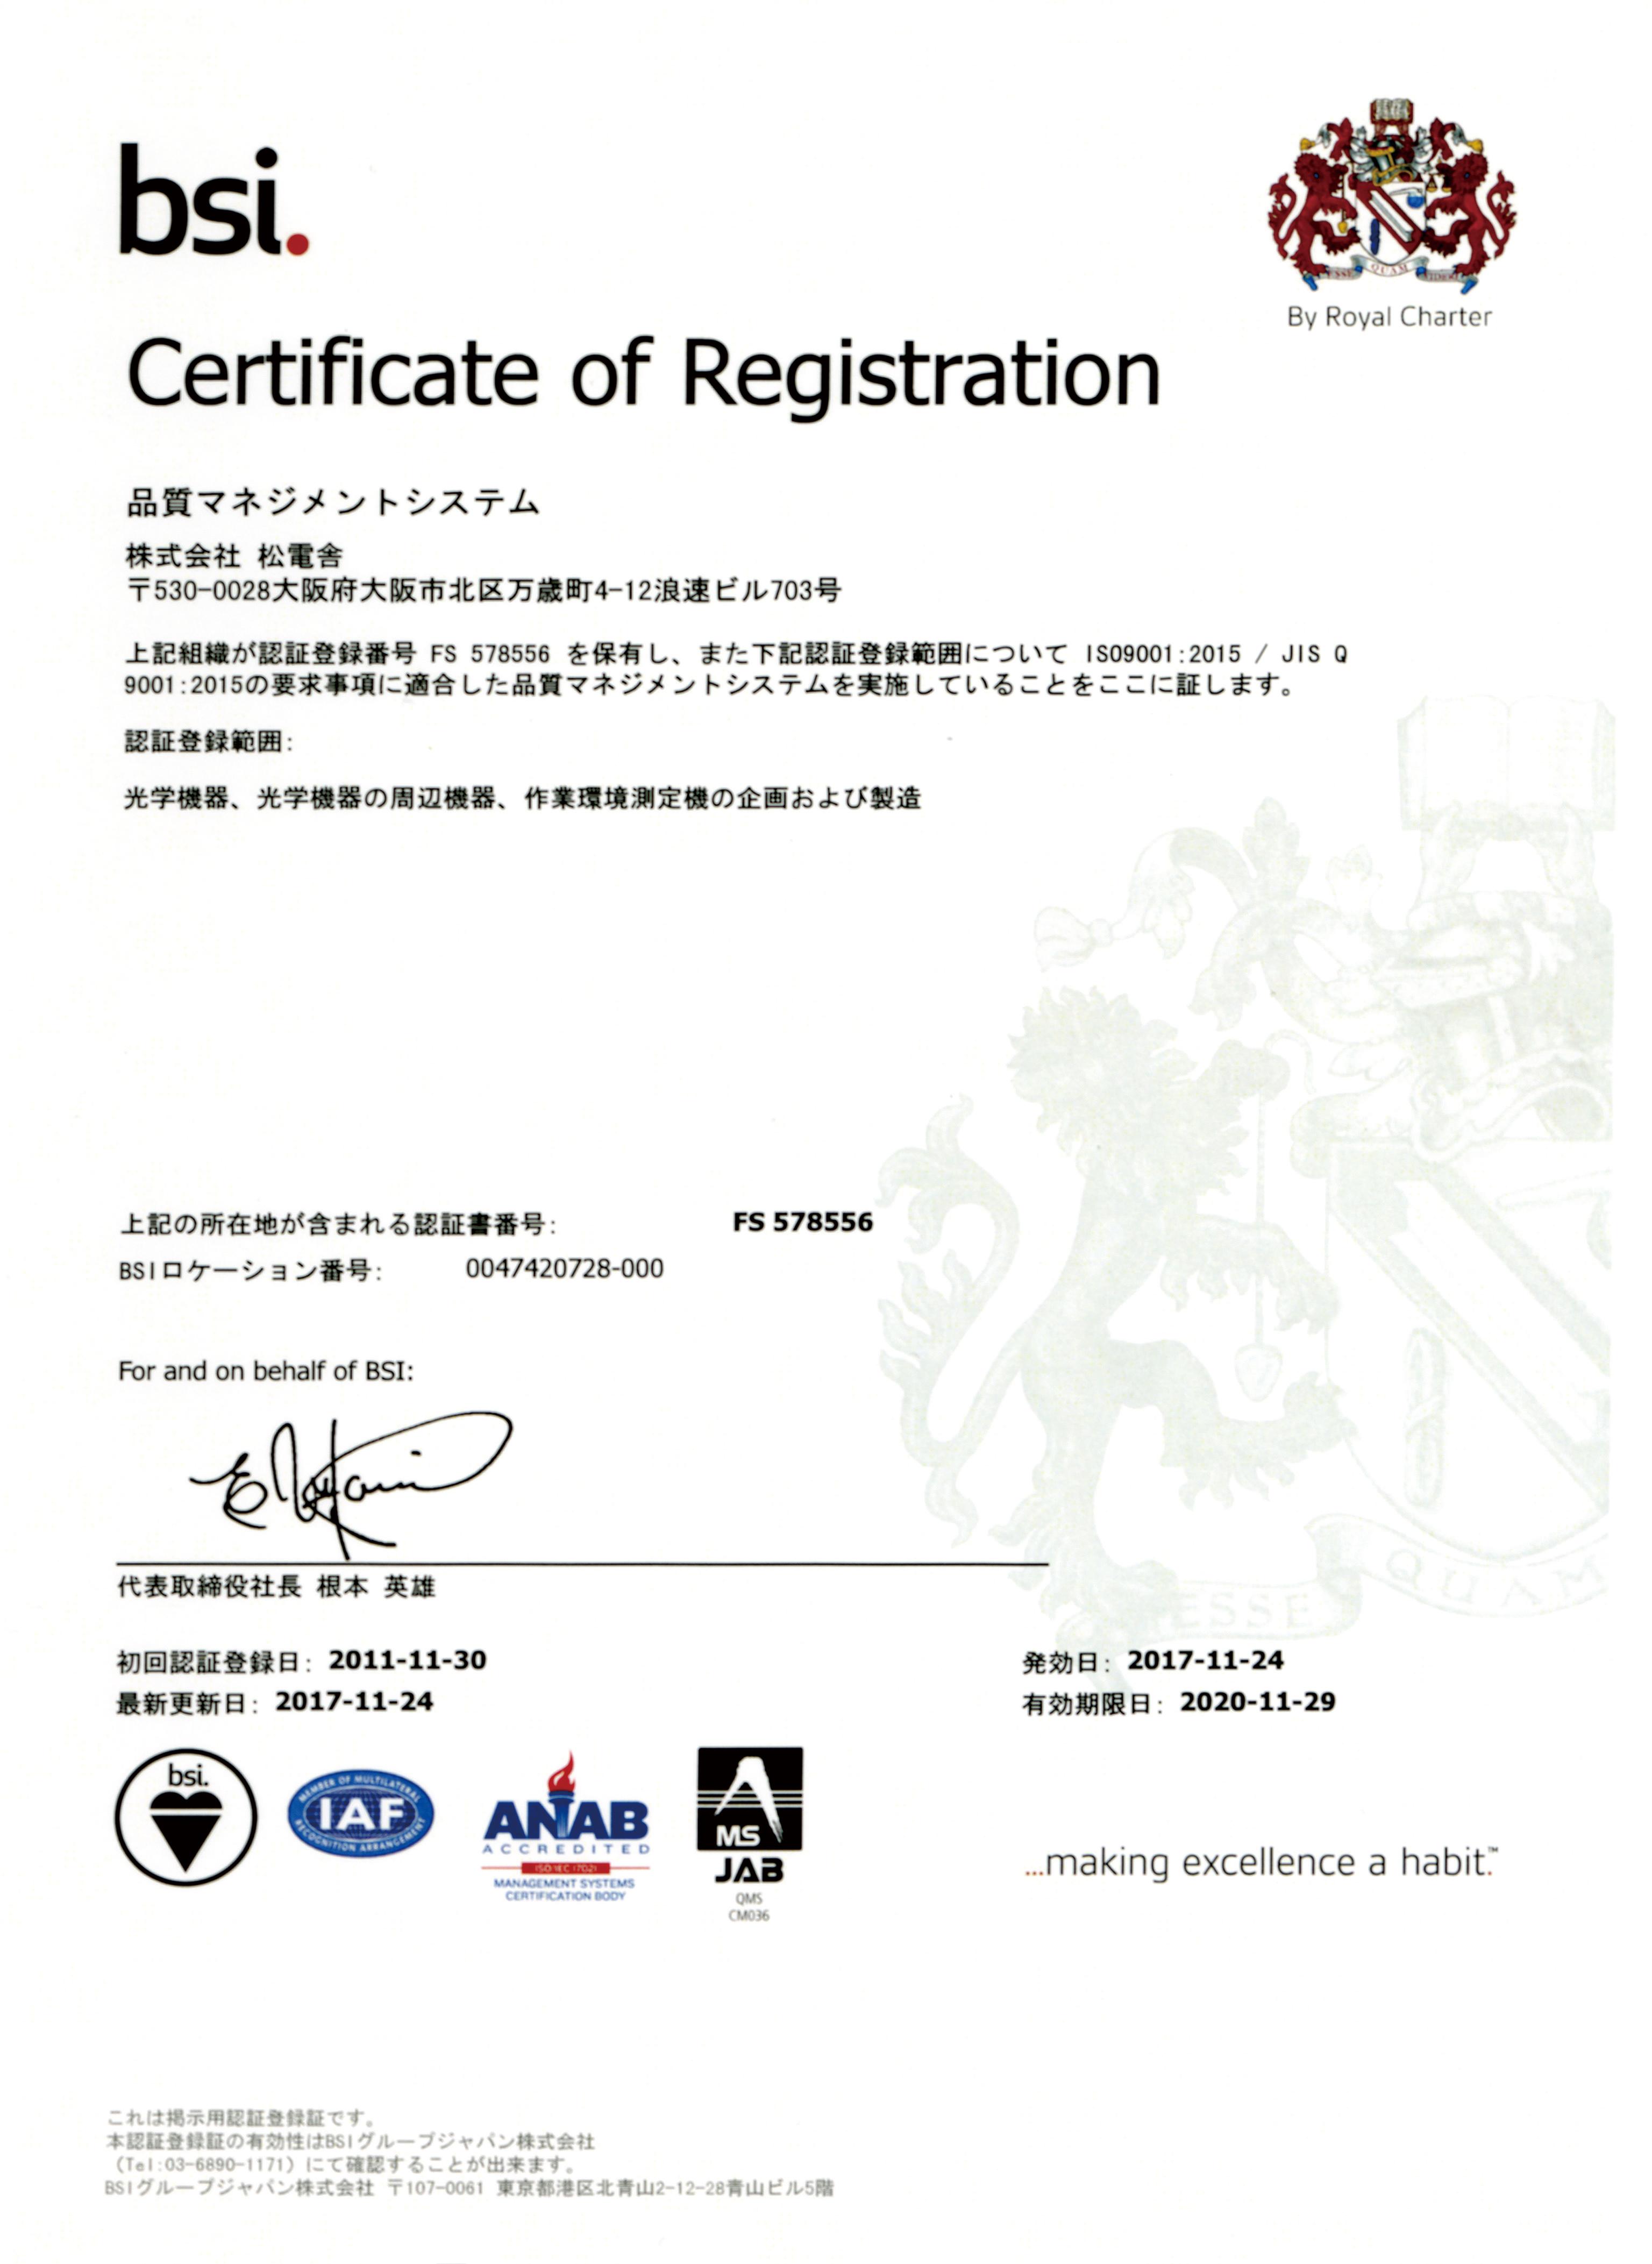 ISO9001 認証書